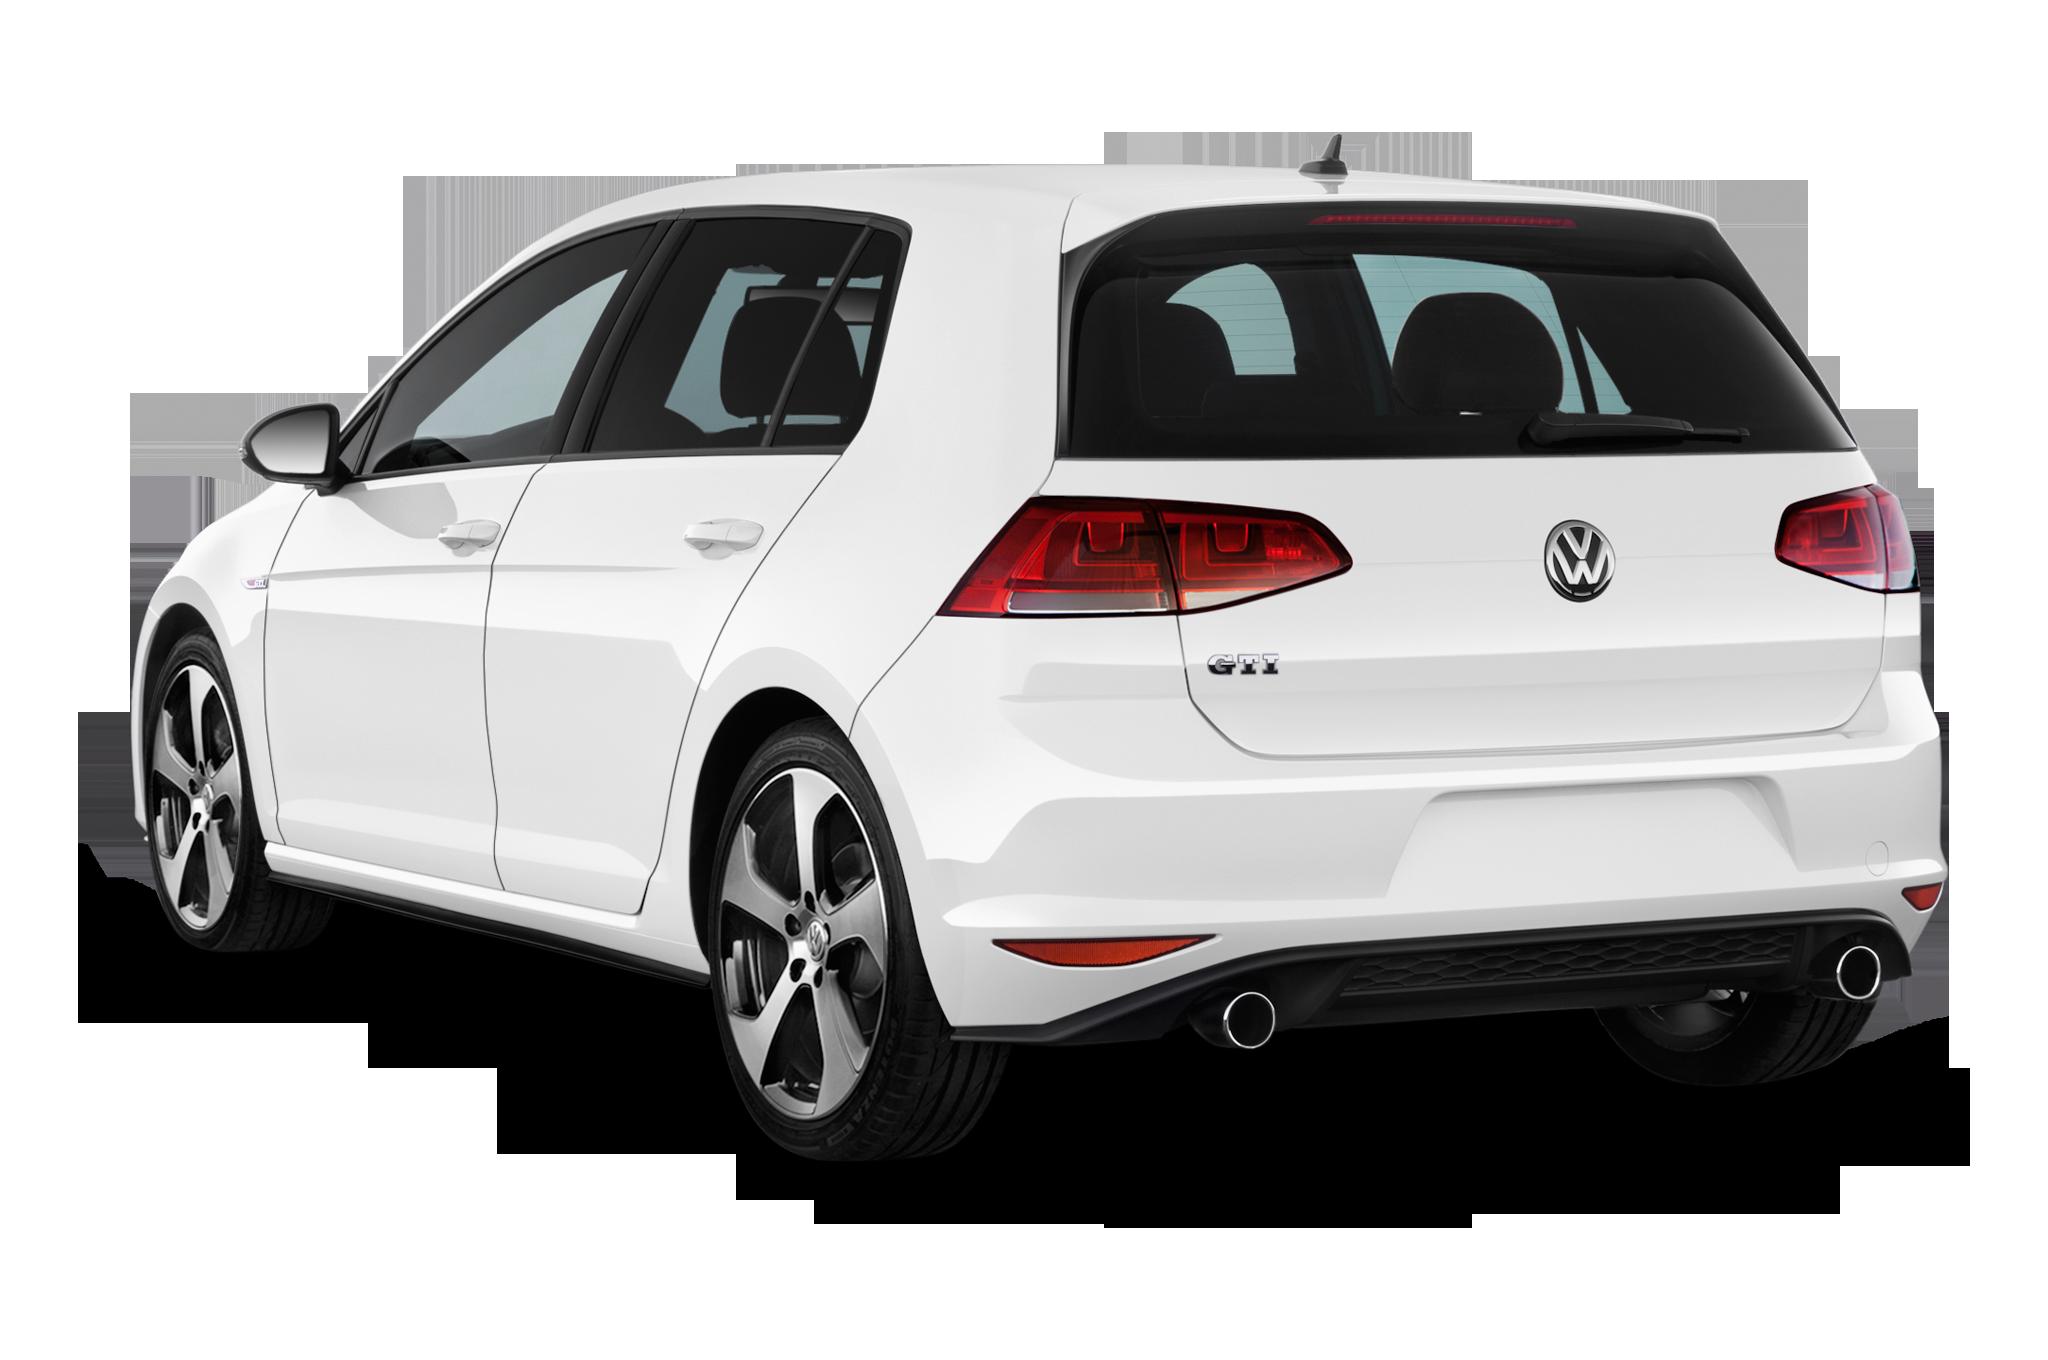 volkswagen golf gti 2015 automobile all star automobile. Black Bedroom Furniture Sets. Home Design Ideas